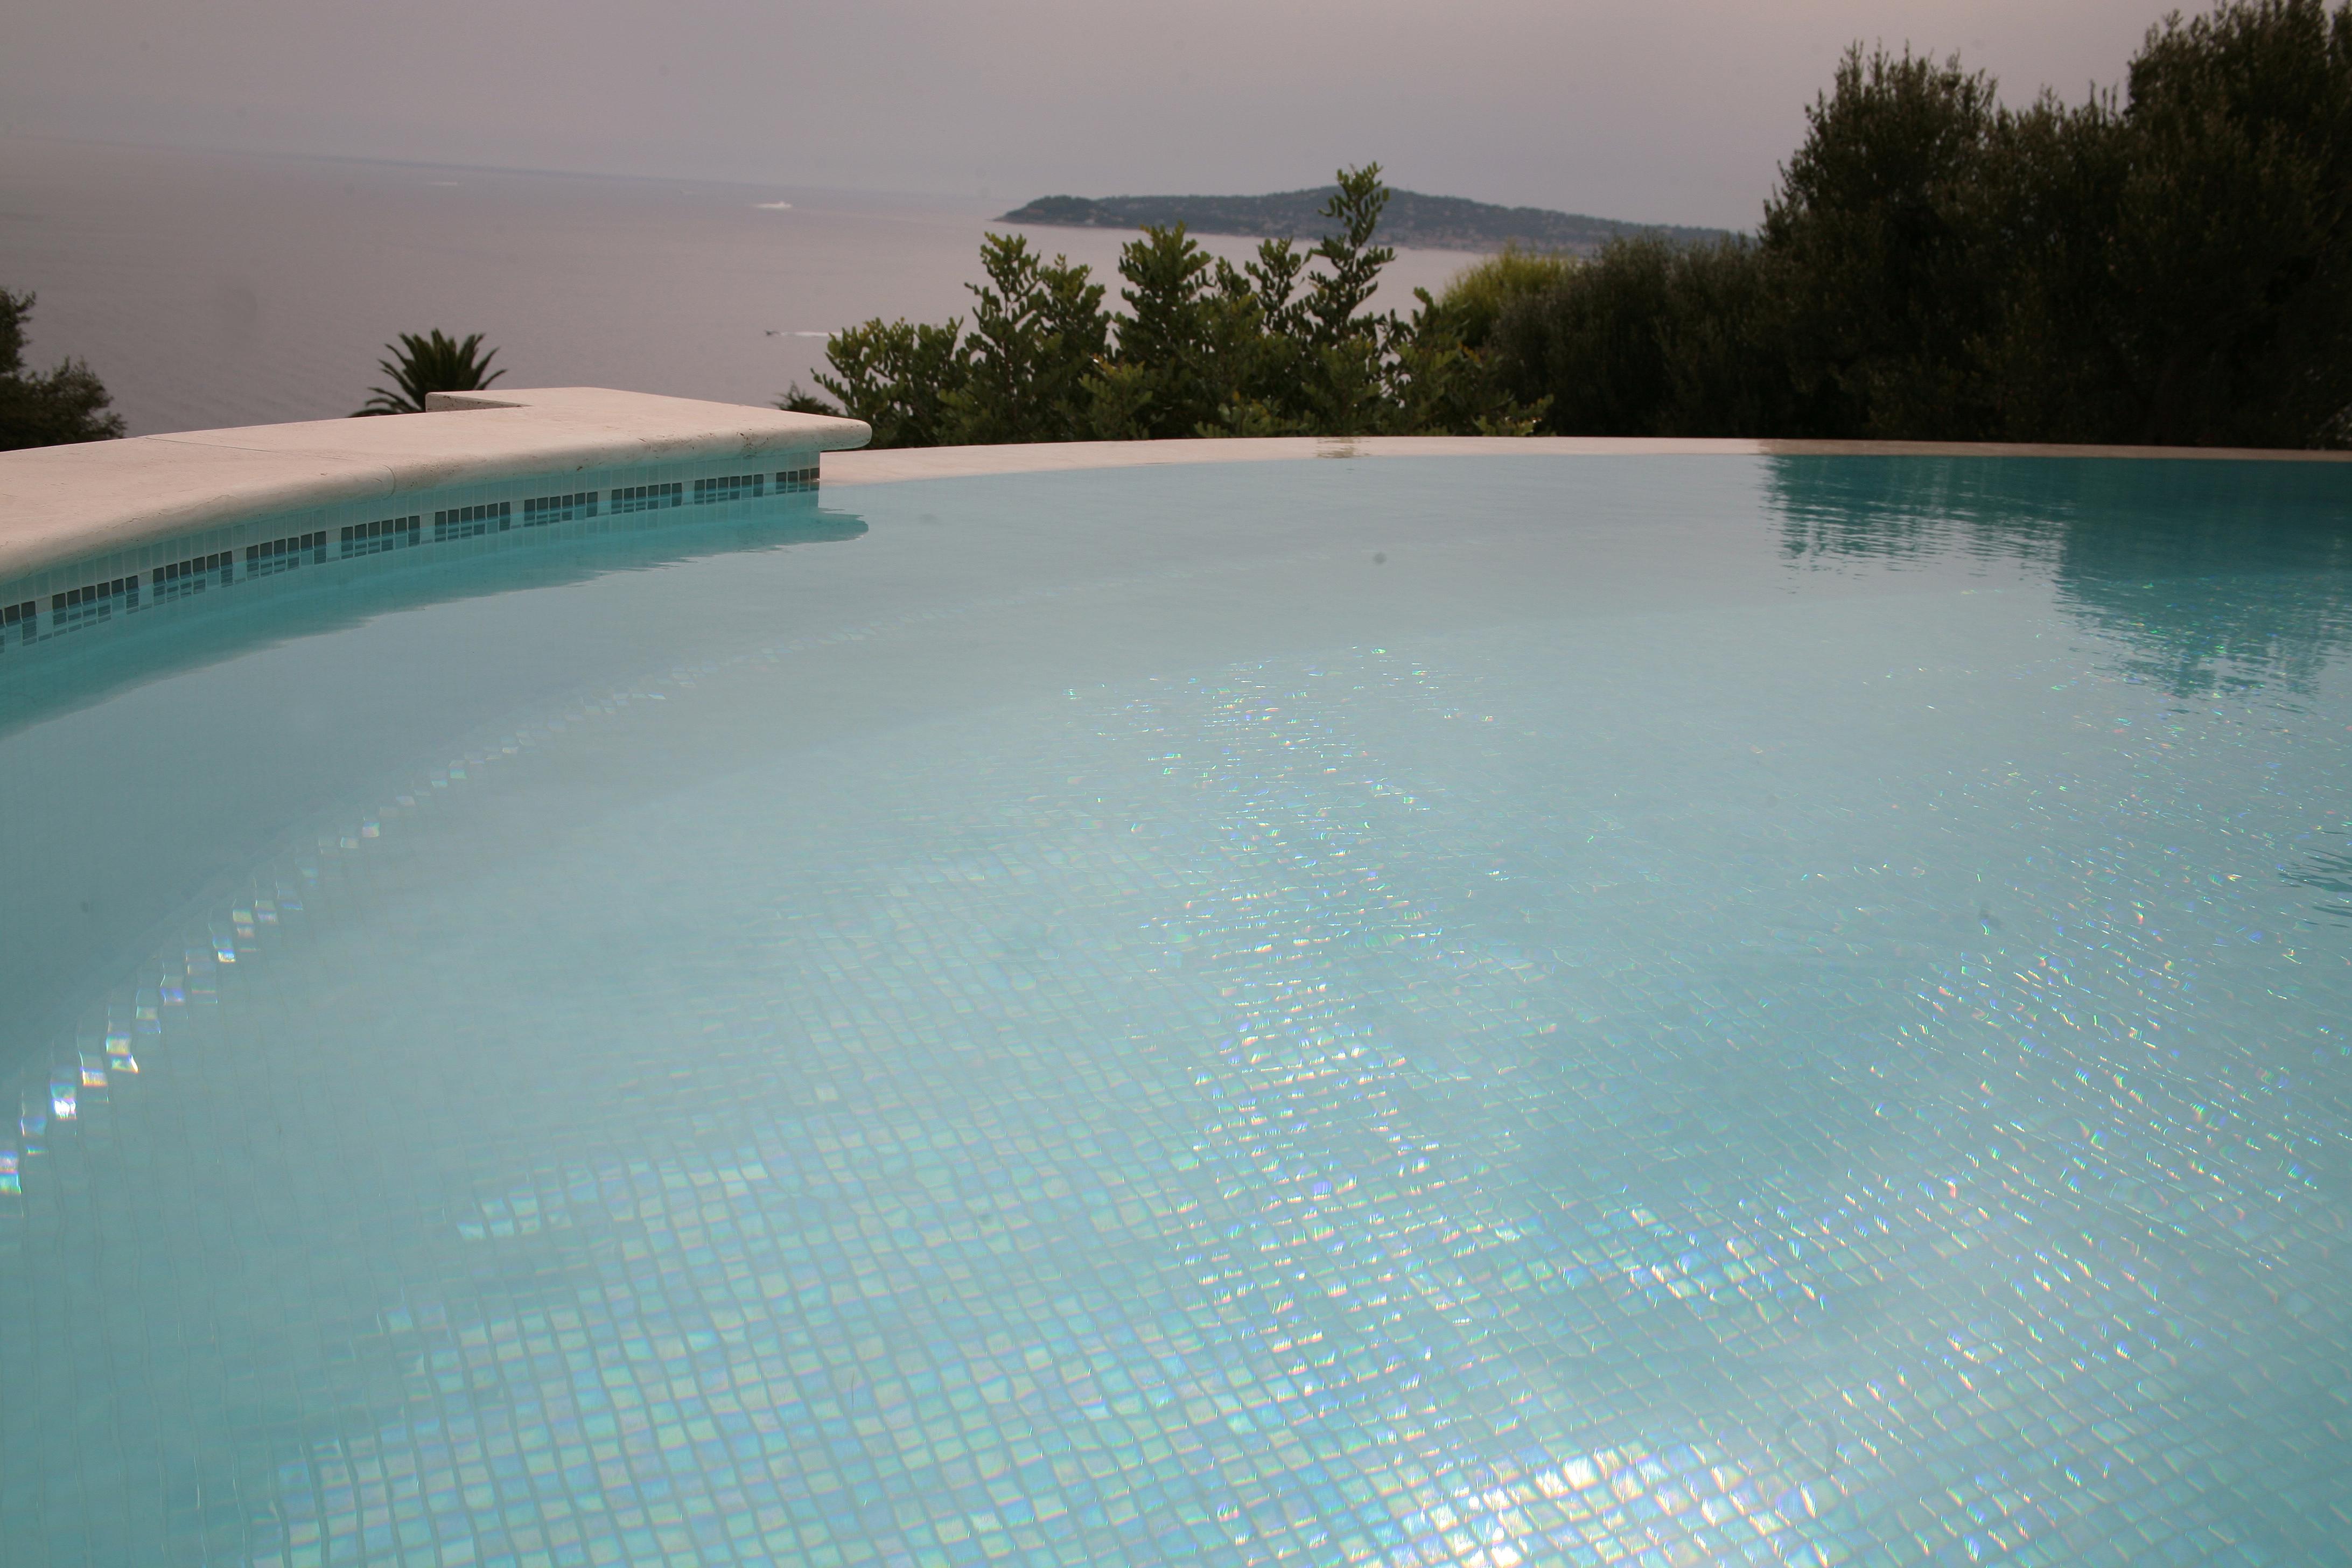 L 39 entretien de votre piscine nice 06 cannes antibes for Piscine de antibes